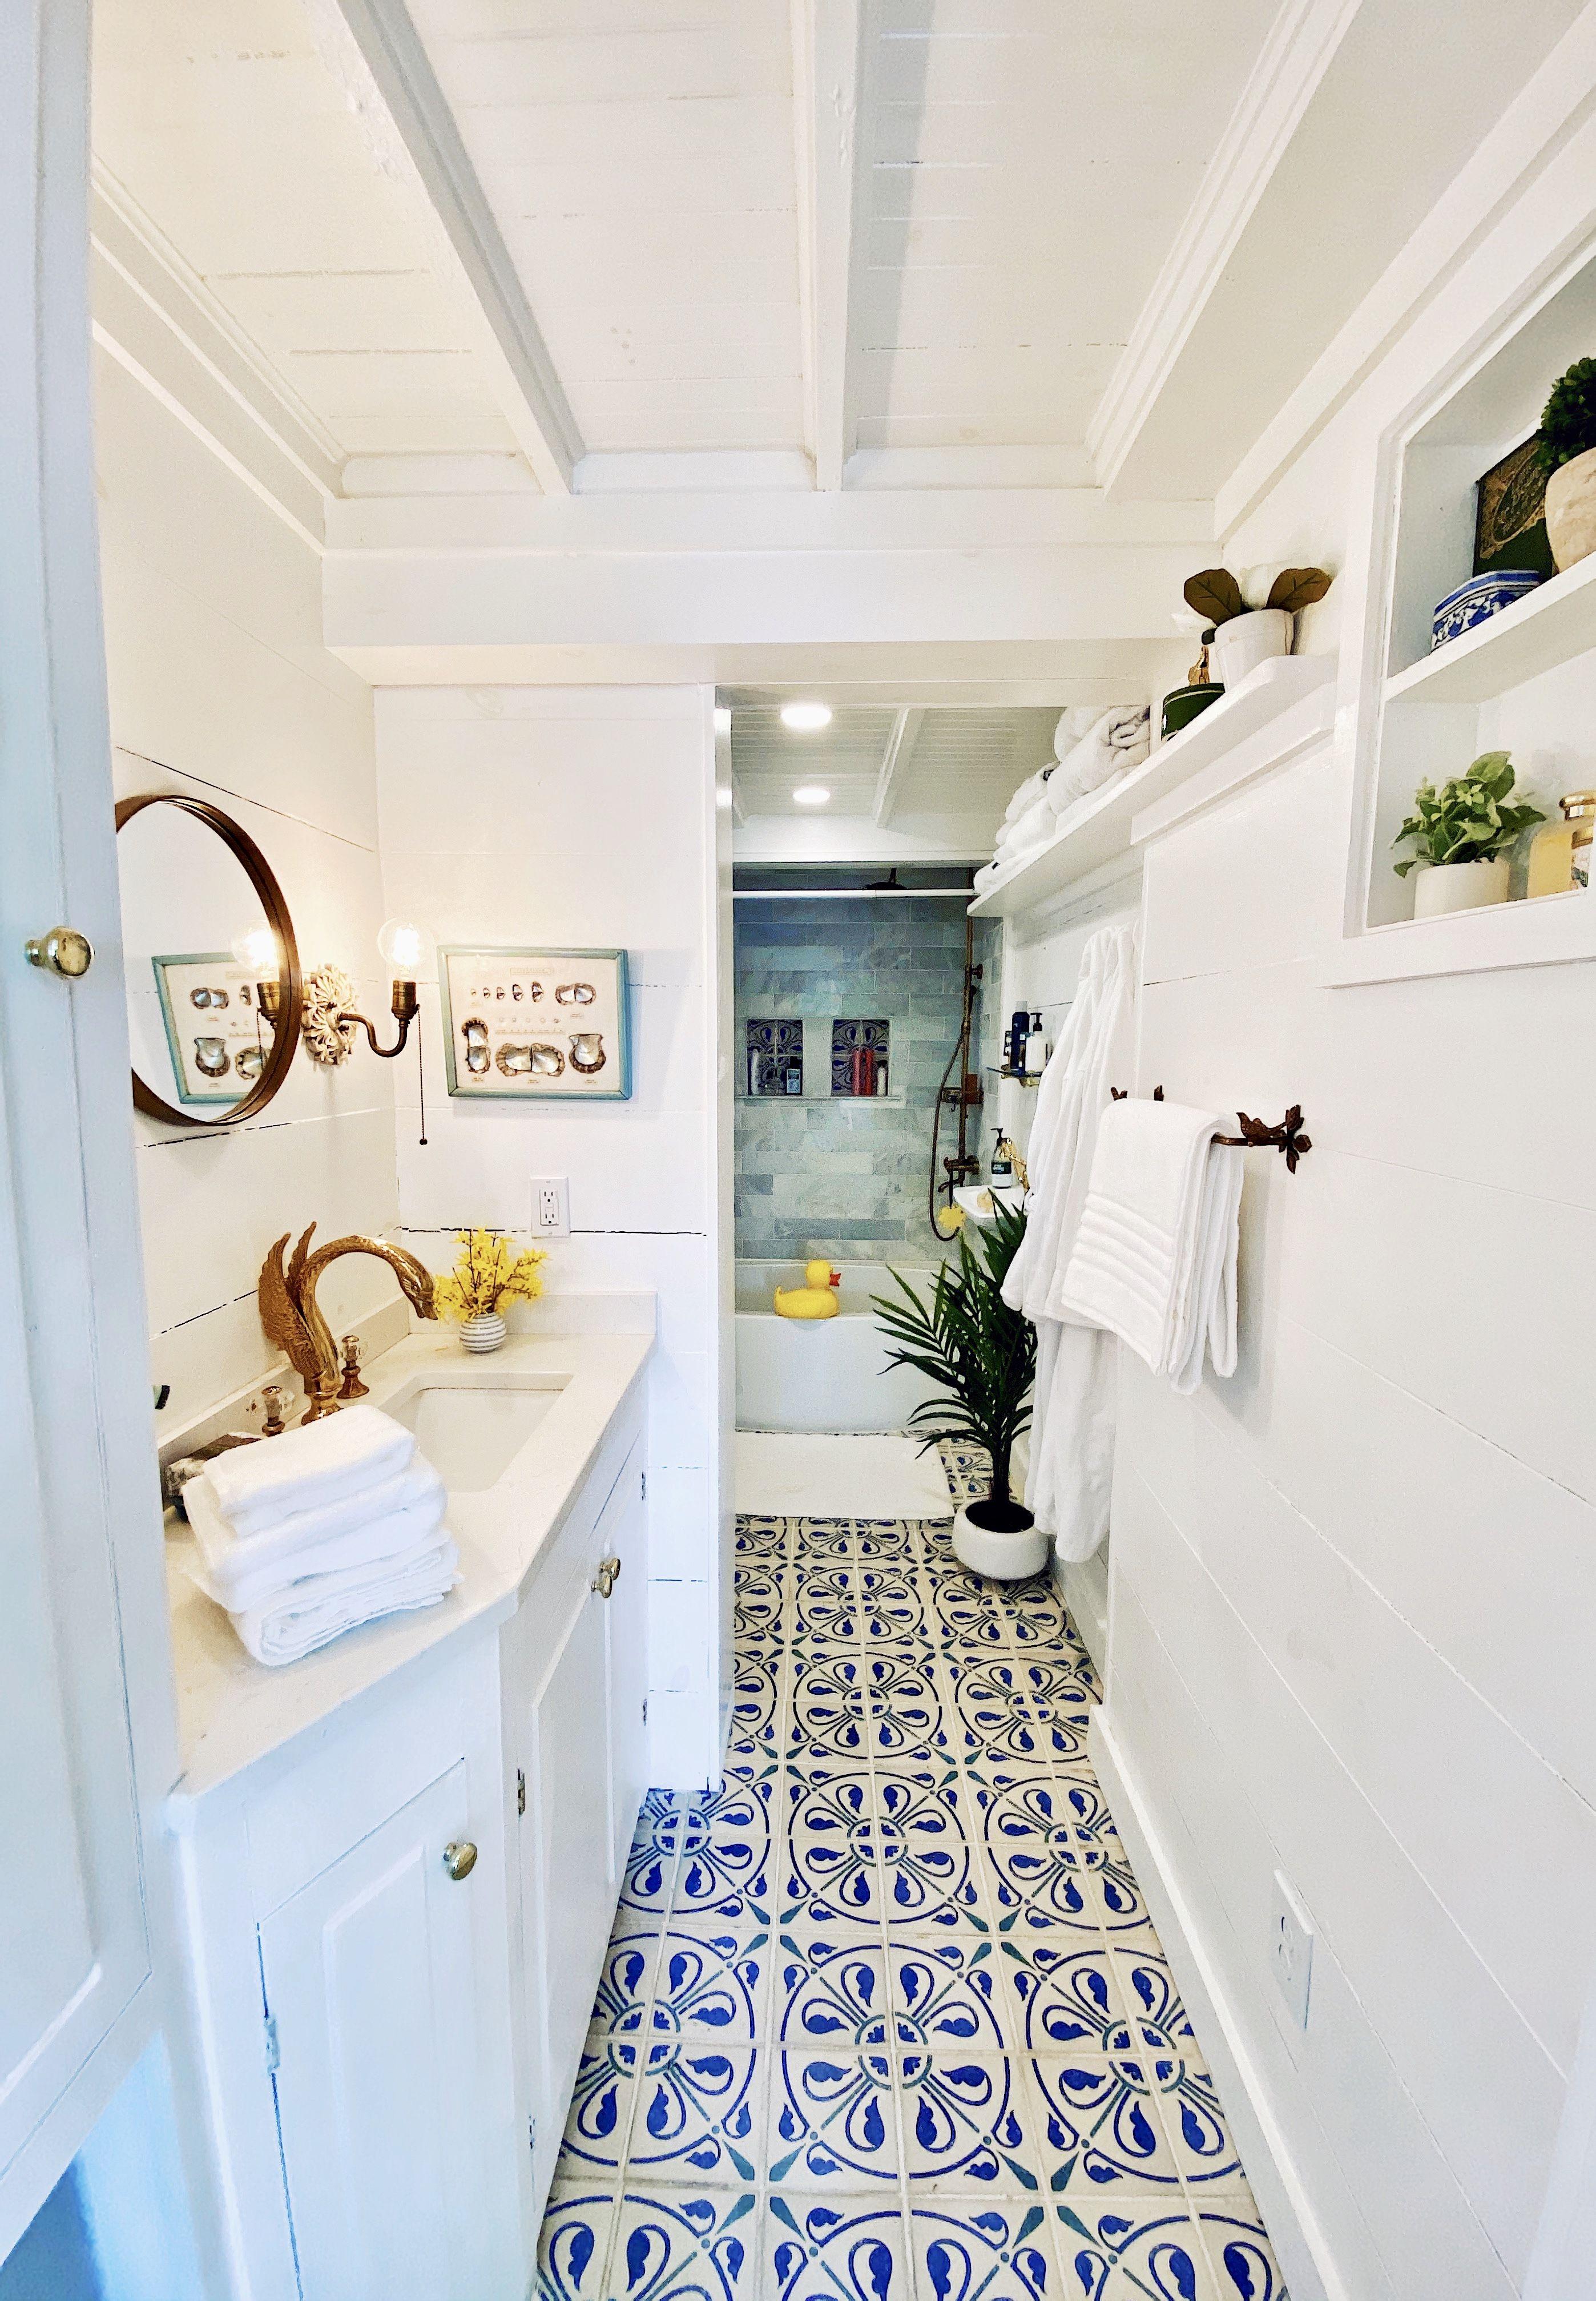 Lakehouse Bathroom Classy Girls Wear, Lake House Bathroom Wall Decor